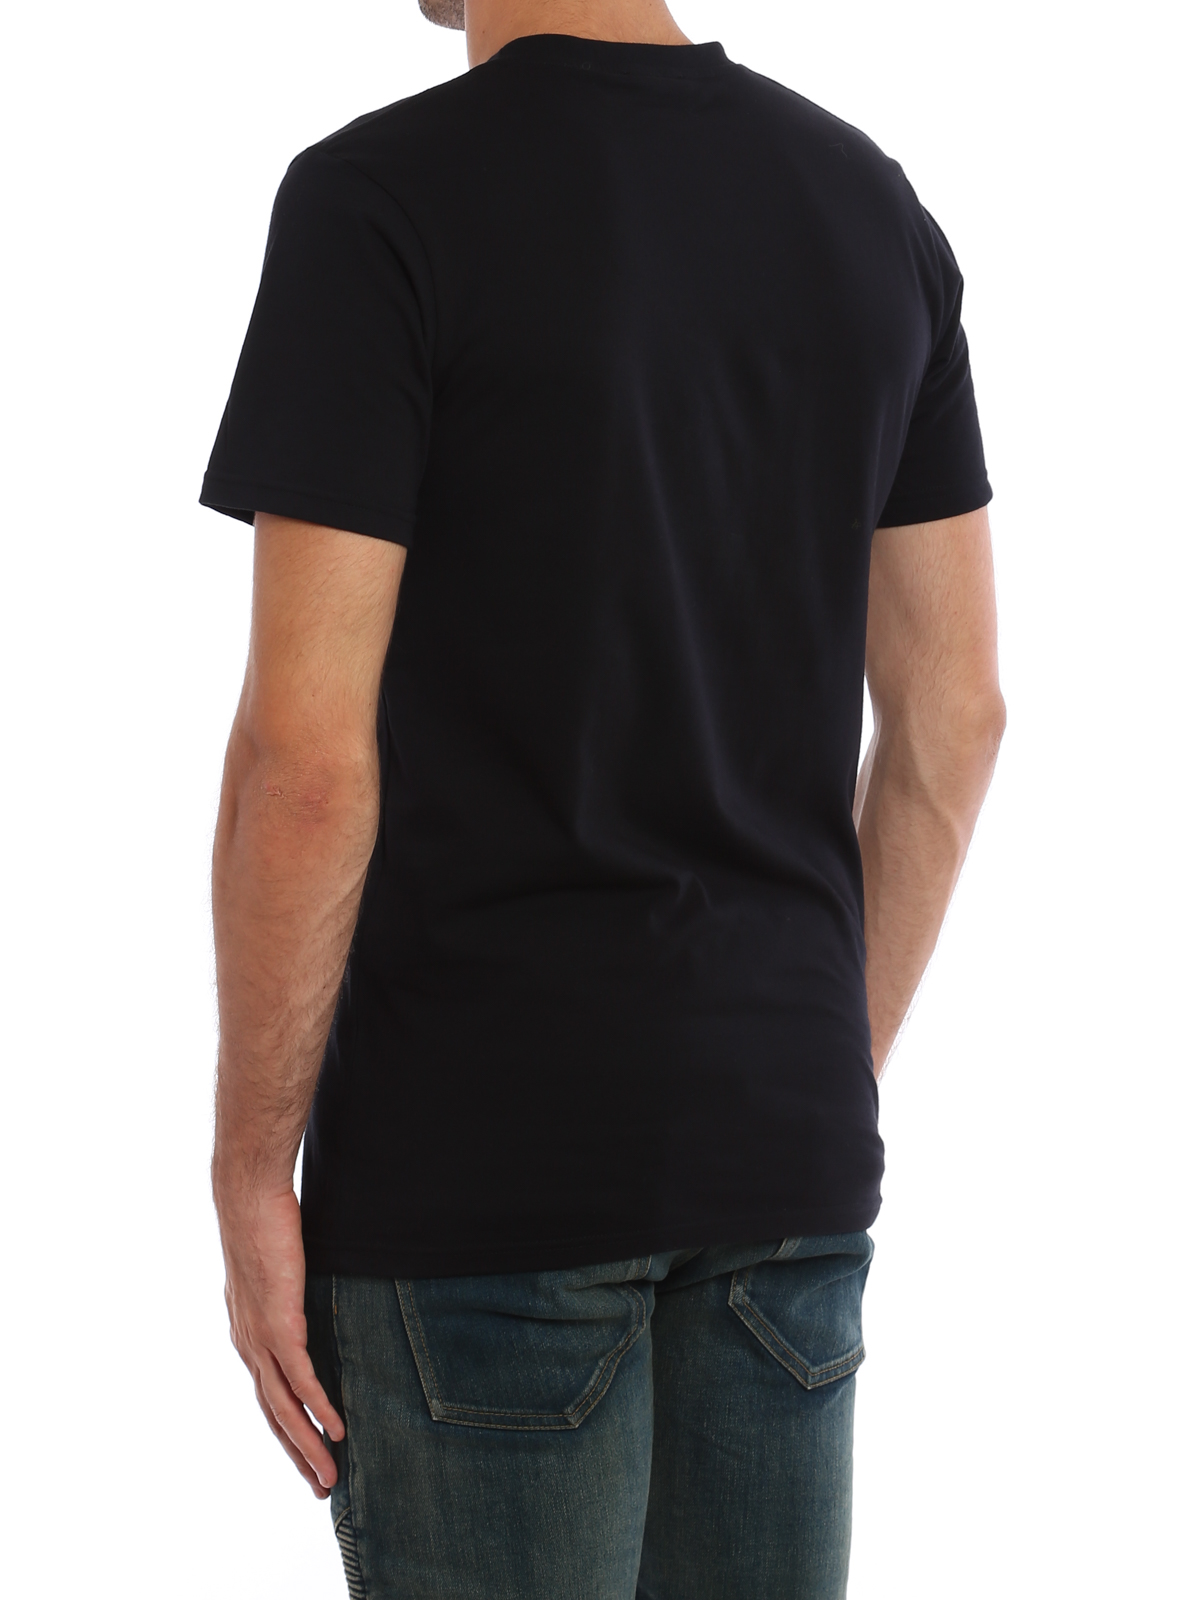 cc17f2dfdc Balmain - Logo and panthers print T-shirt - t-shirts - W7H8601I081176